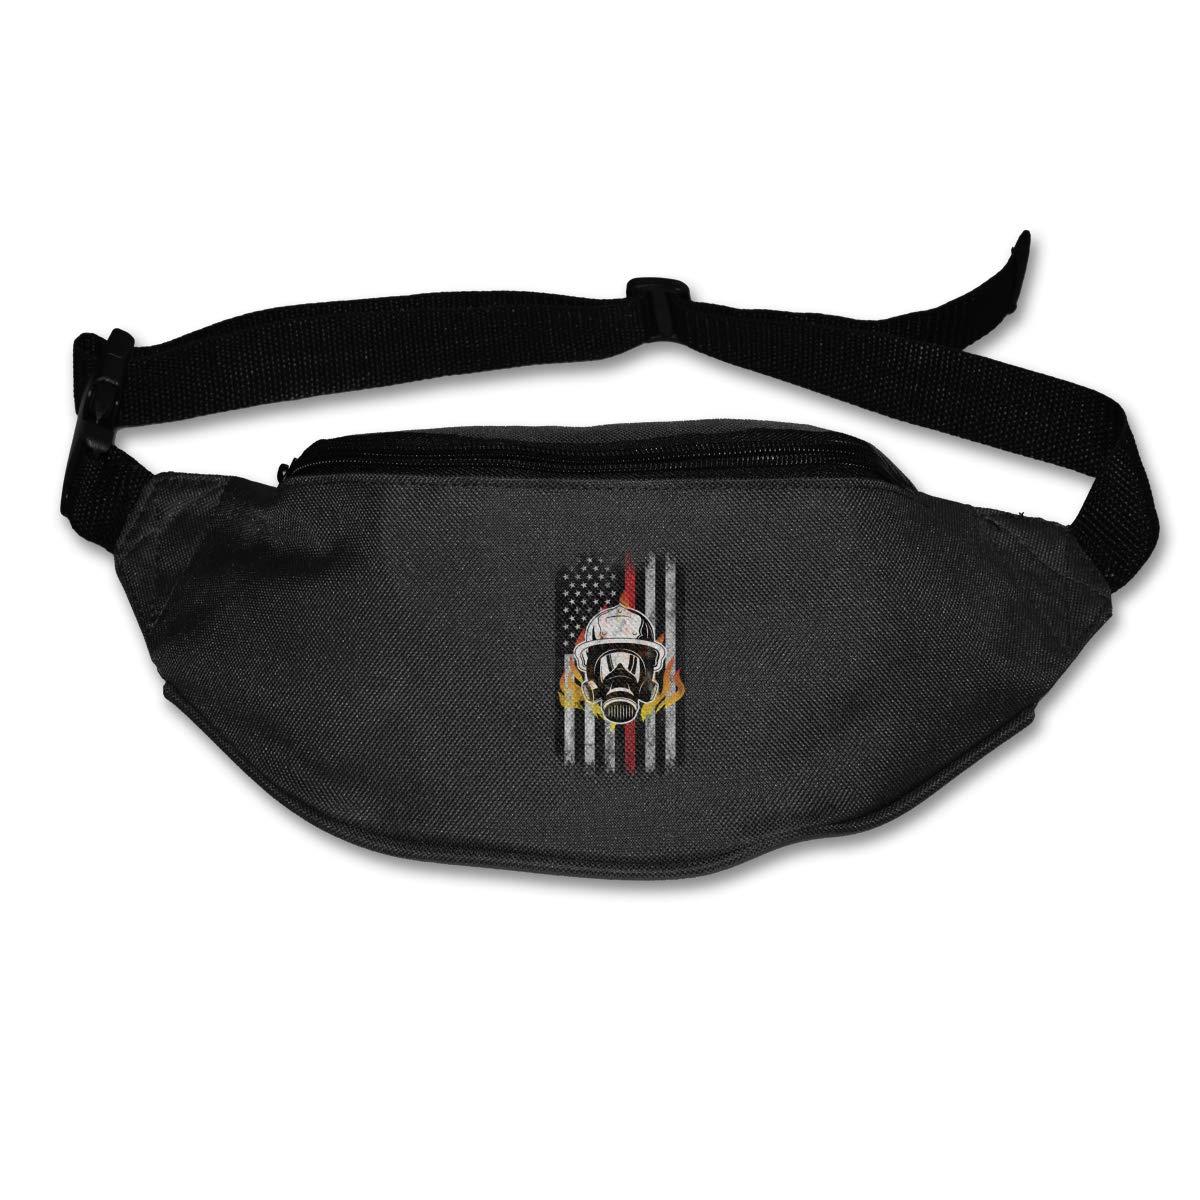 Helmet Flames American Flag Sport Waist Packs Fanny Pack Adjustable For Travel